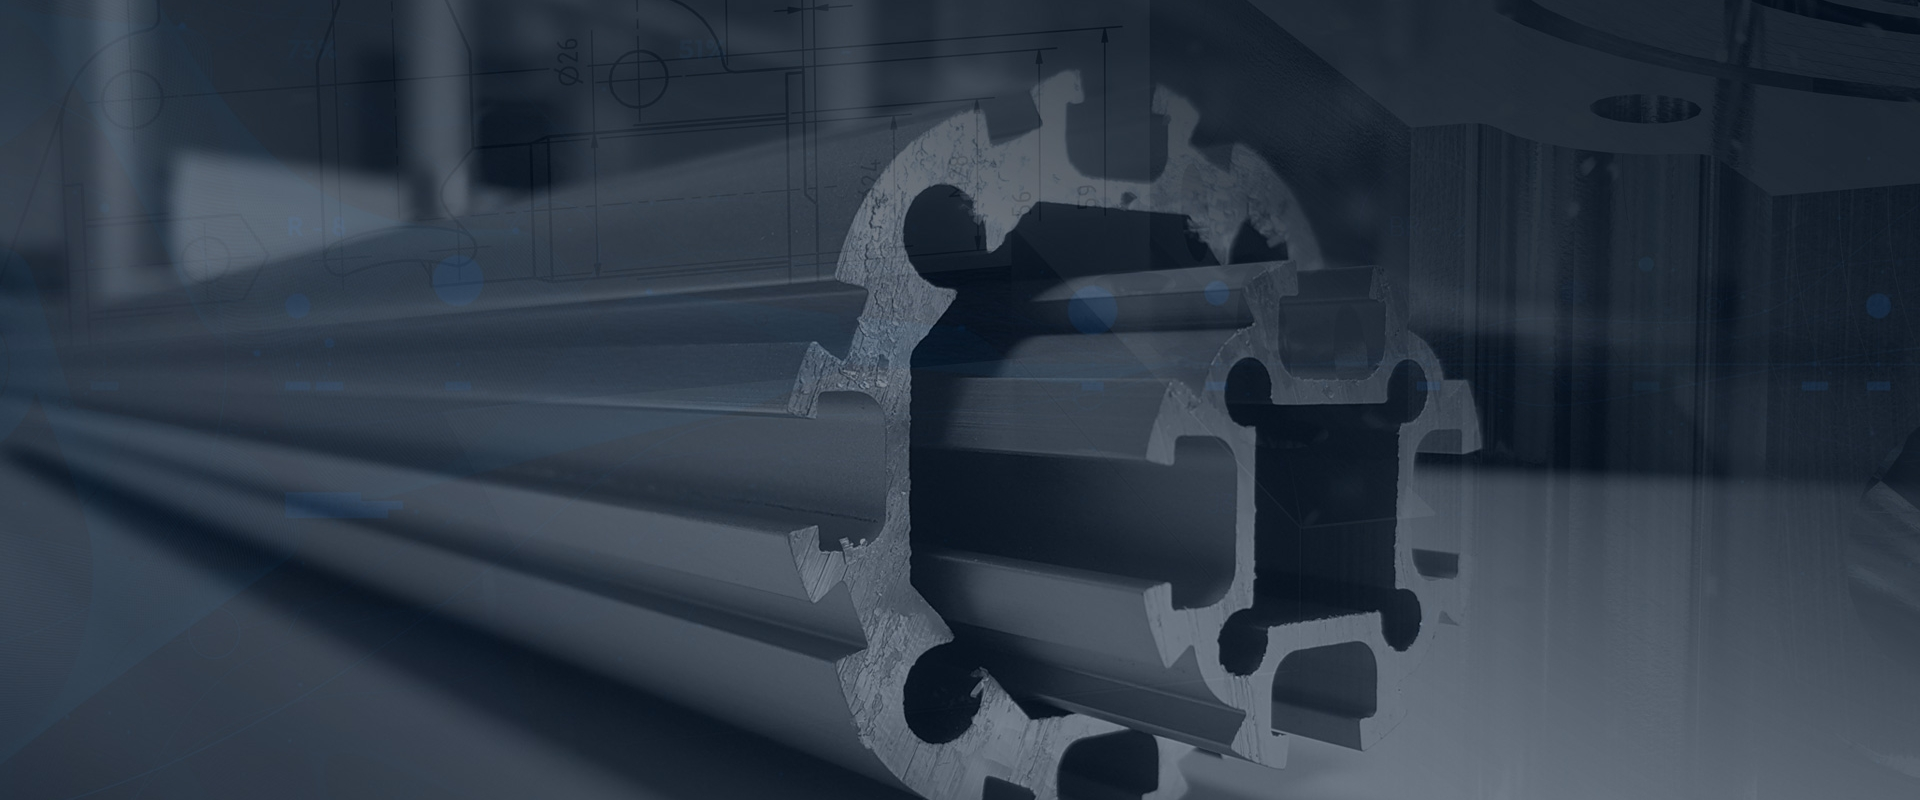 tube profil profilé aluminium lean manufacturing modulaire robuste